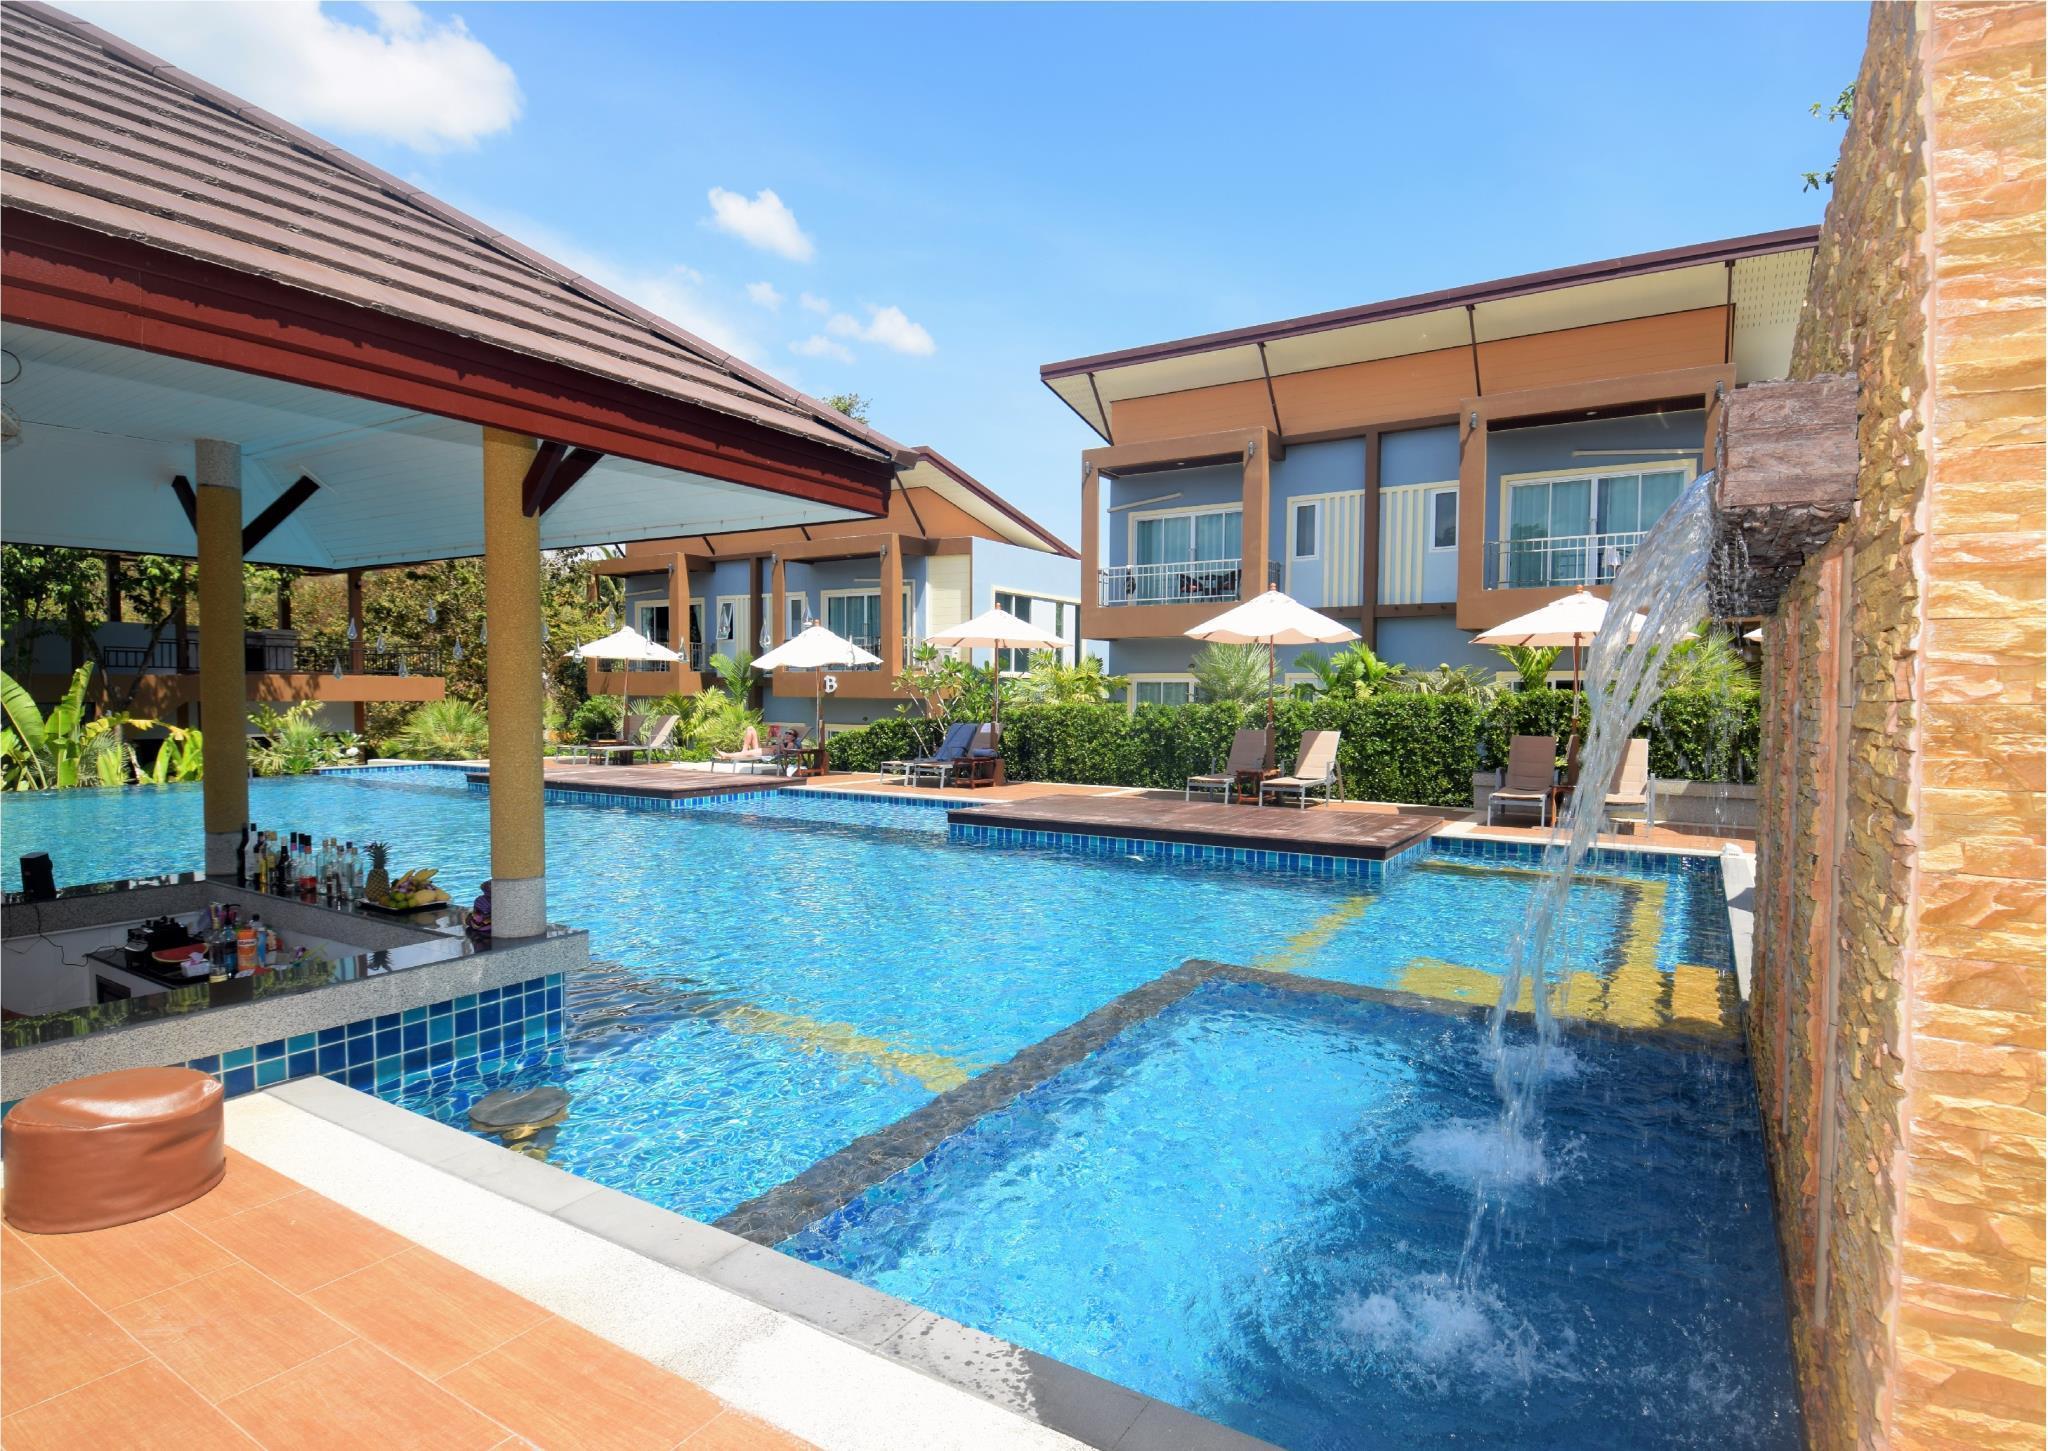 Phutara Lanta Resort ภูธารา ลันตา รีสอร์ท